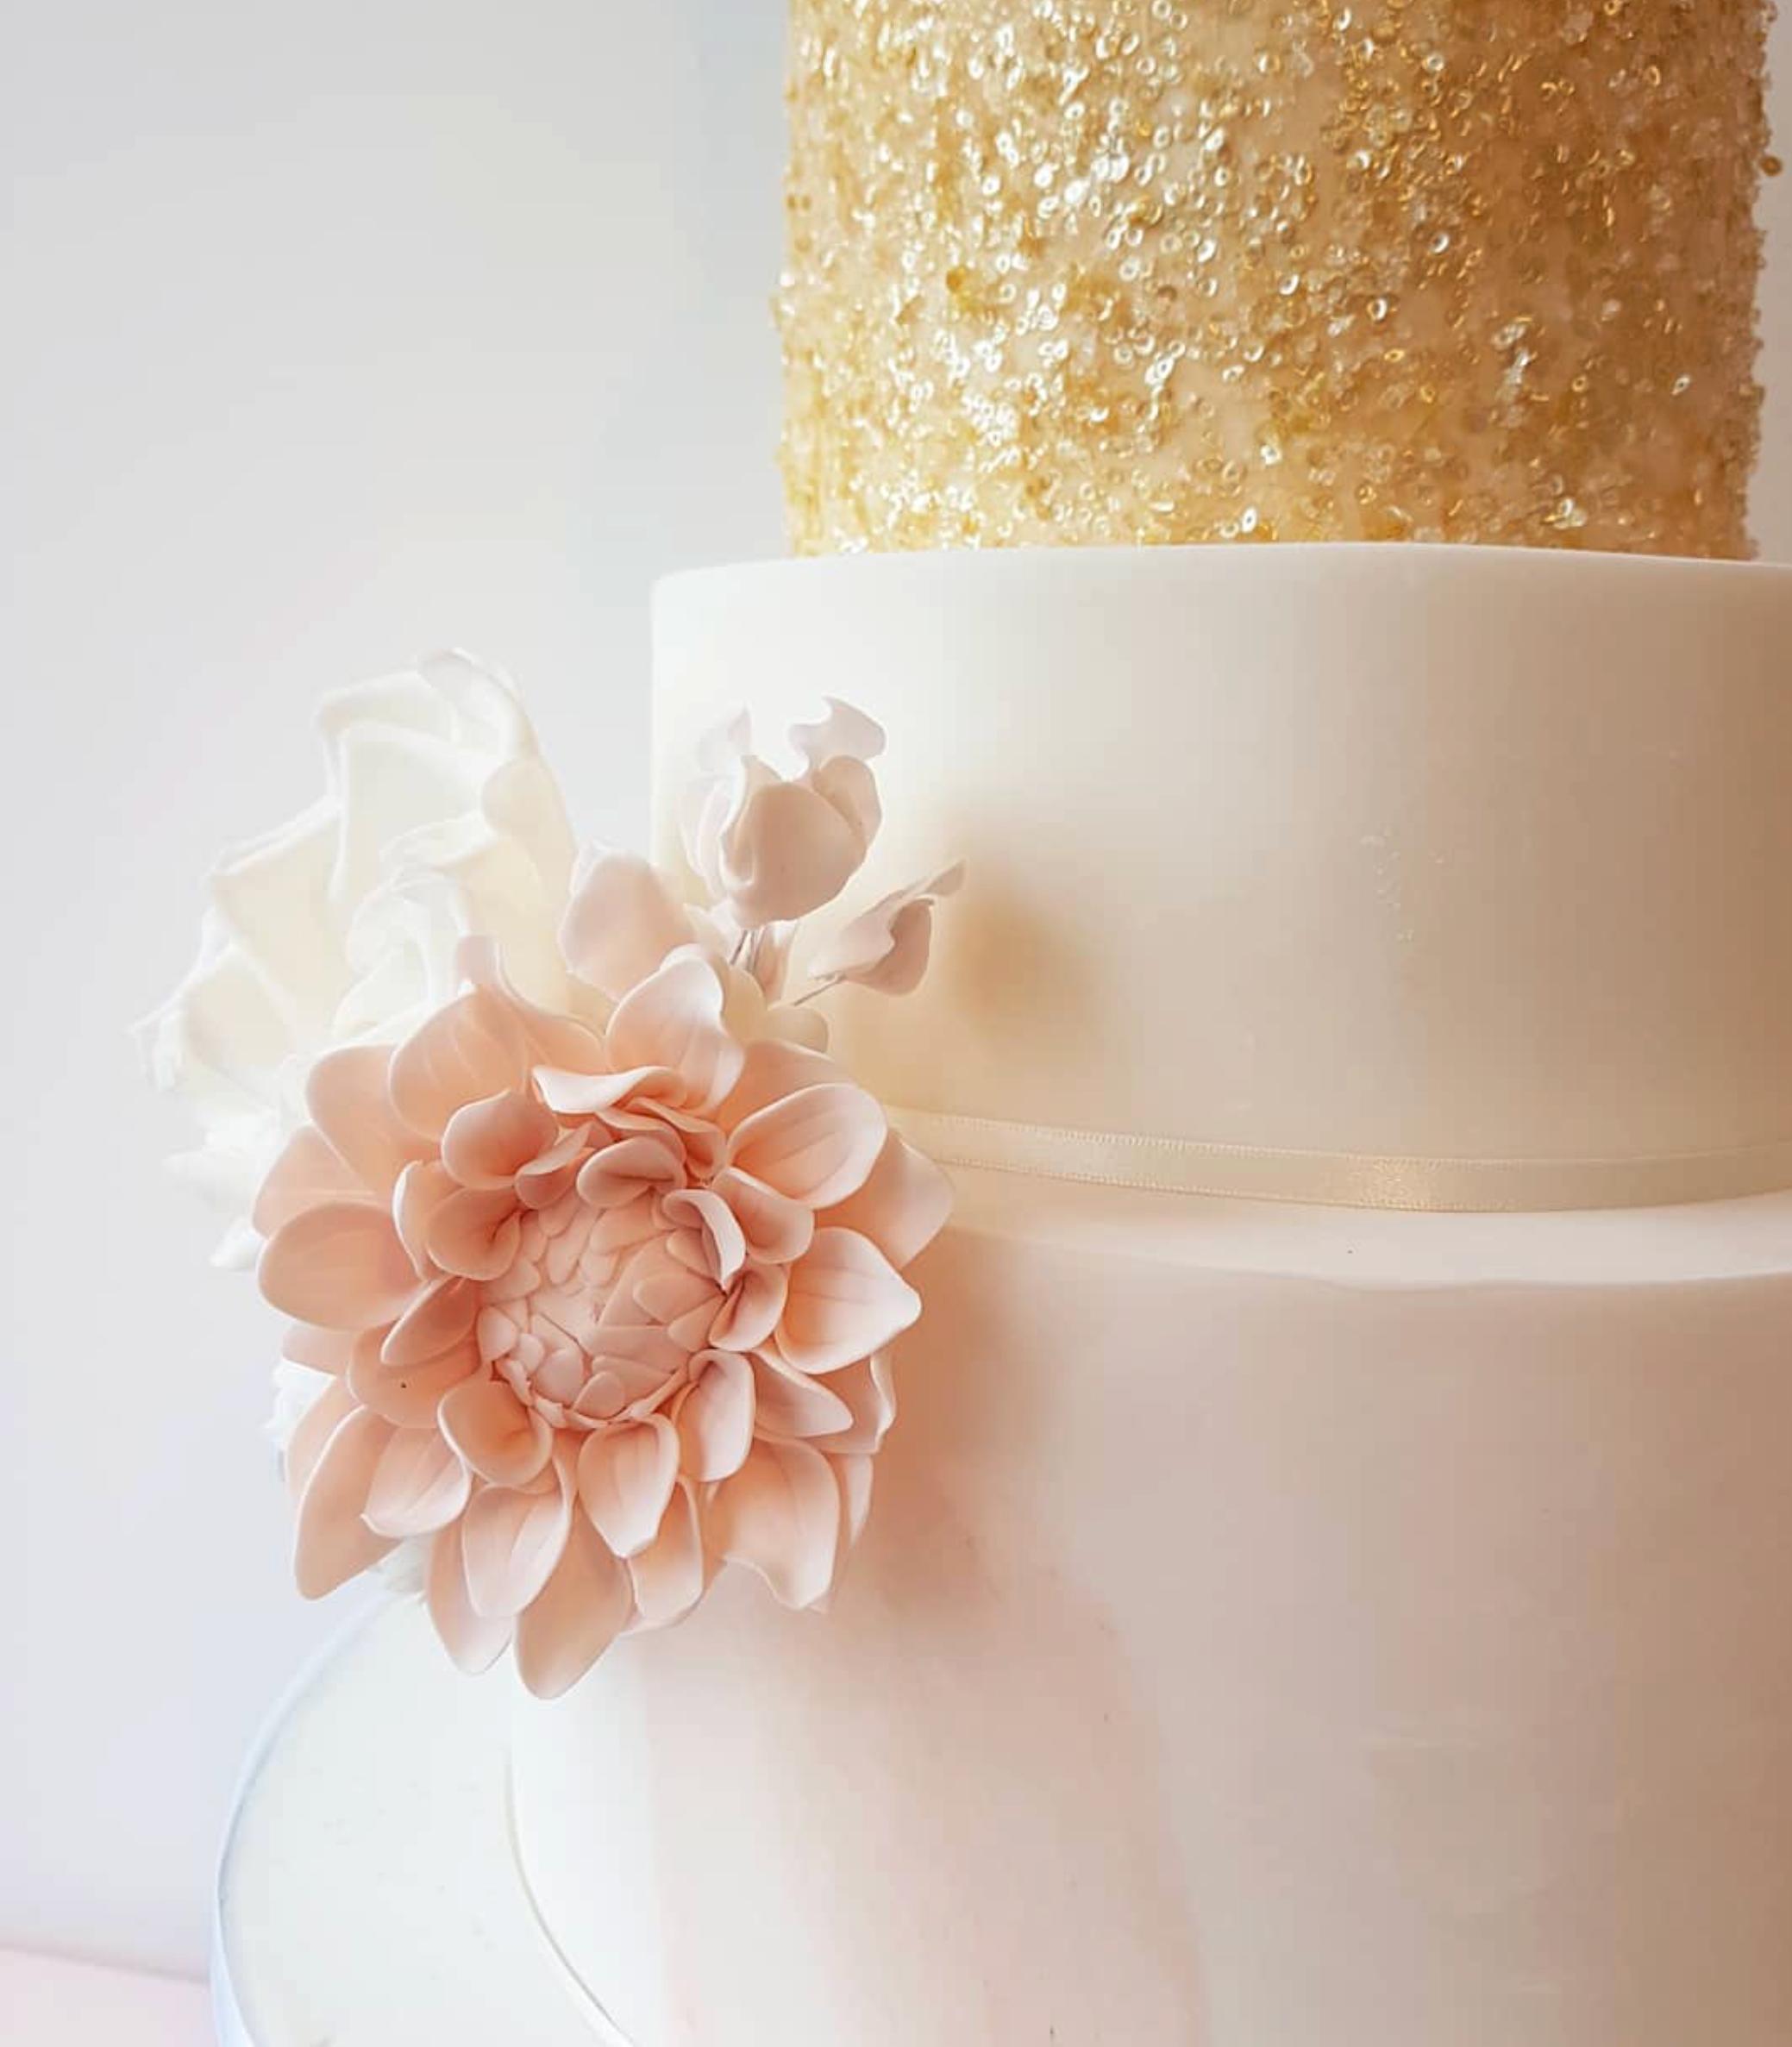 DOTTY ROSE CAKE DESIGN GOLD AND BLUSH WEDDING CAKE.png